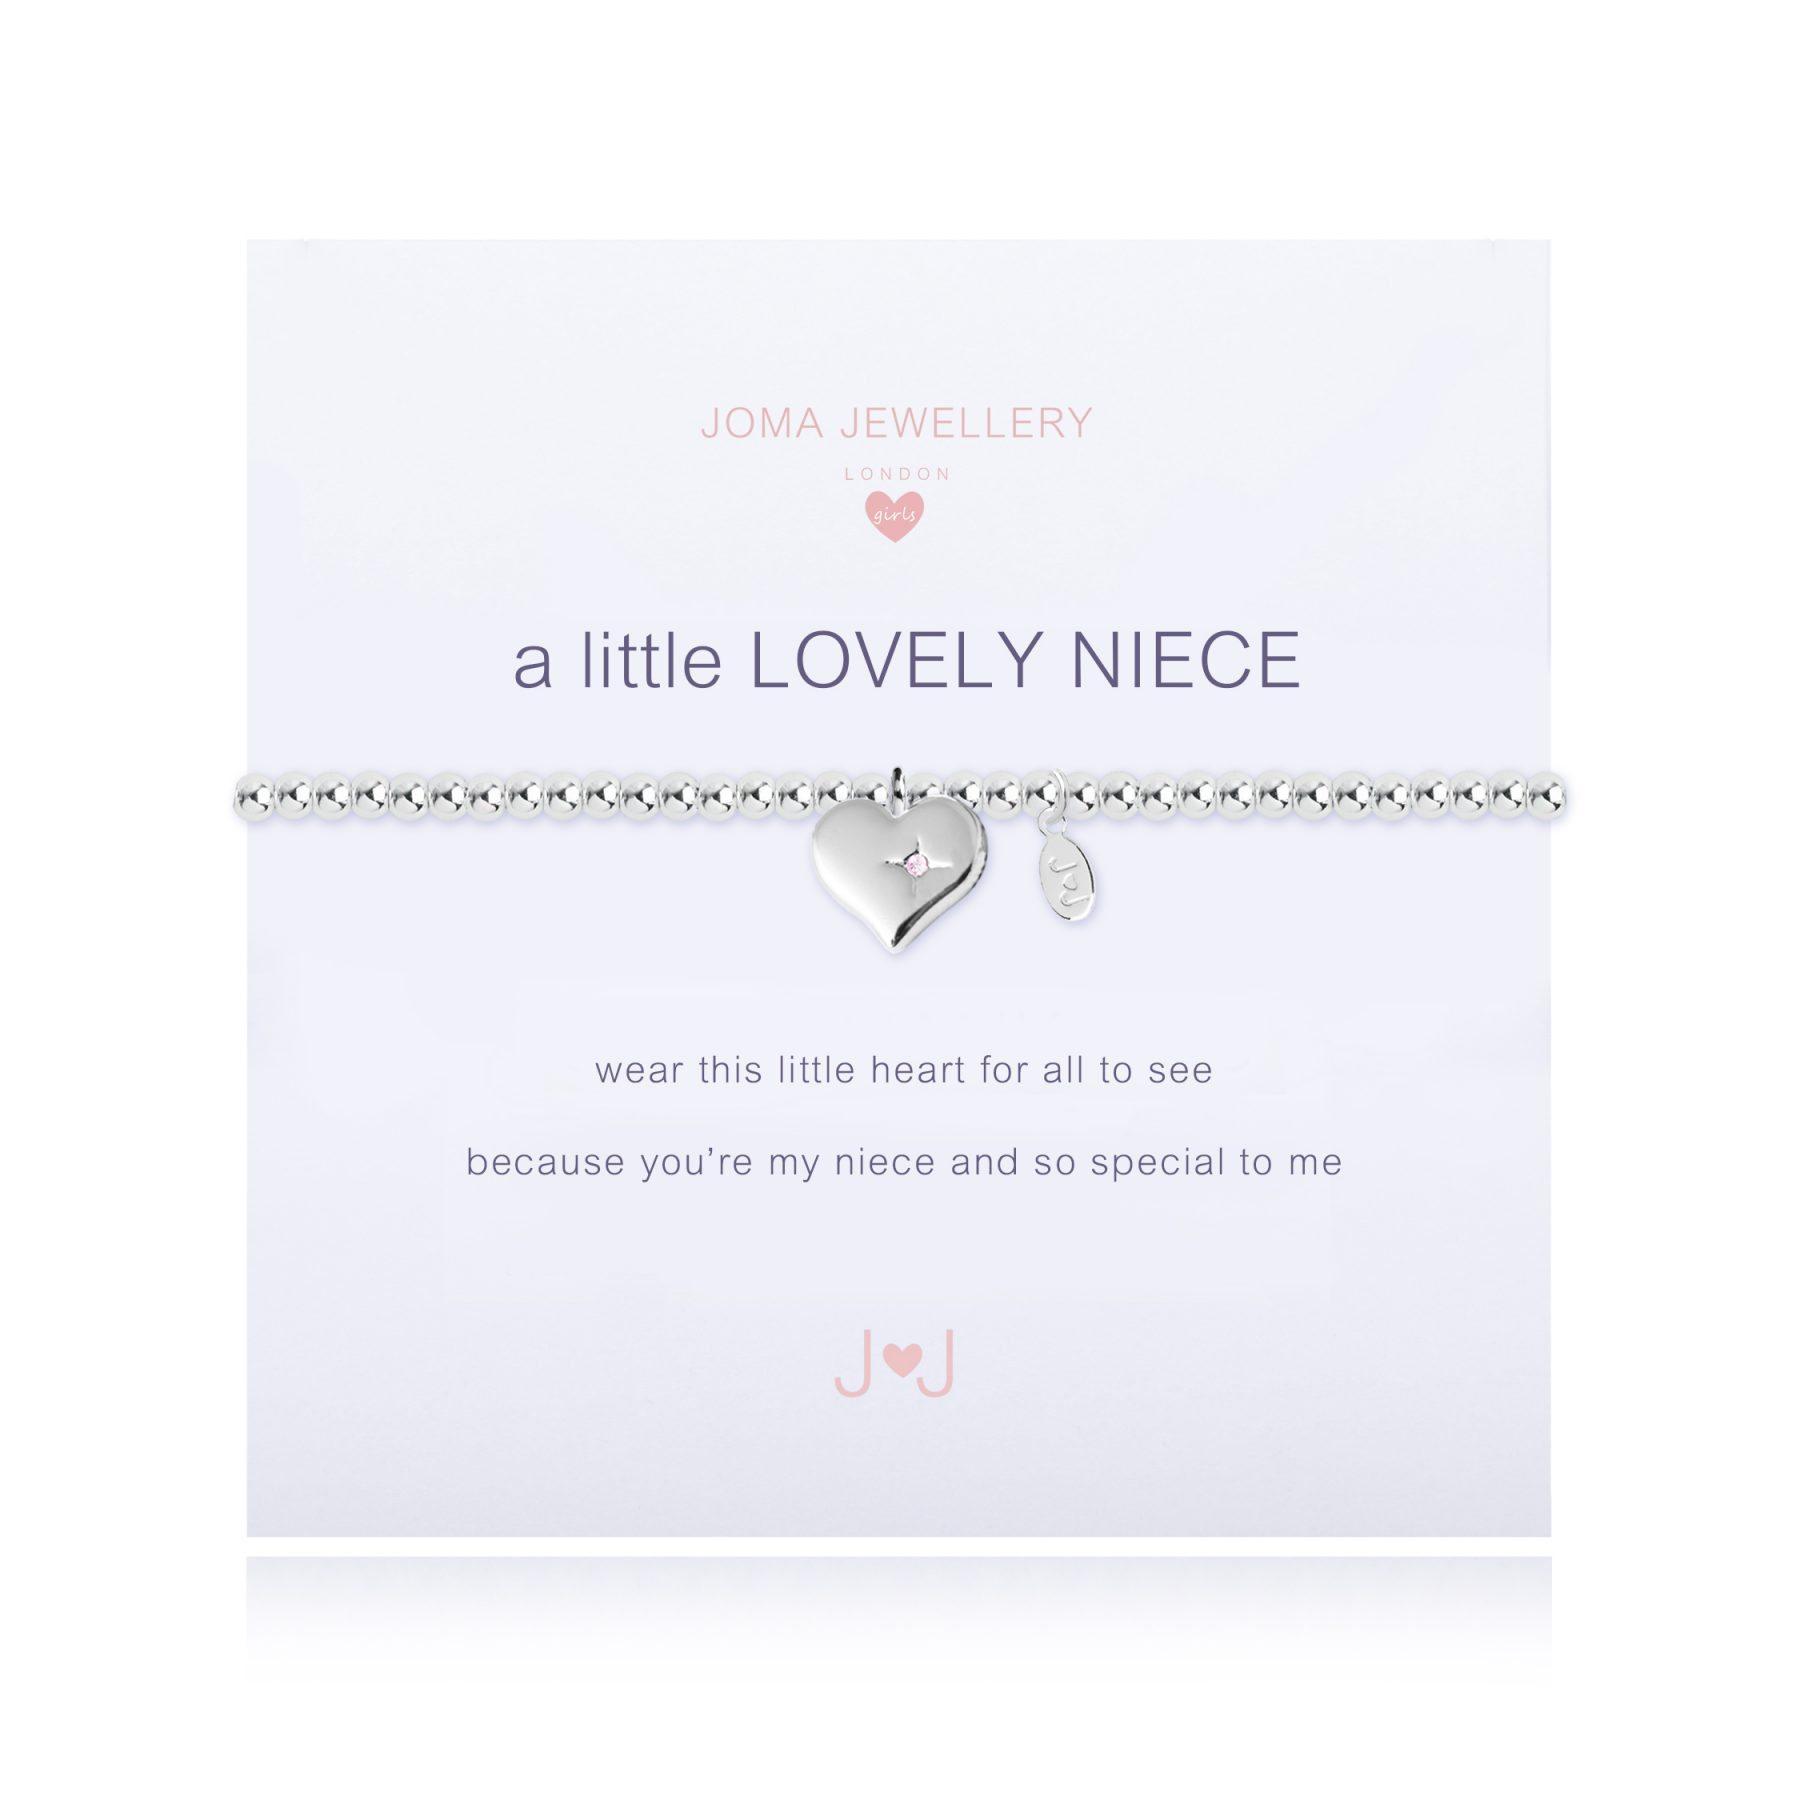 Joma Jewellery Childrens a little Lovely Niece bracelet iL0ehOczI